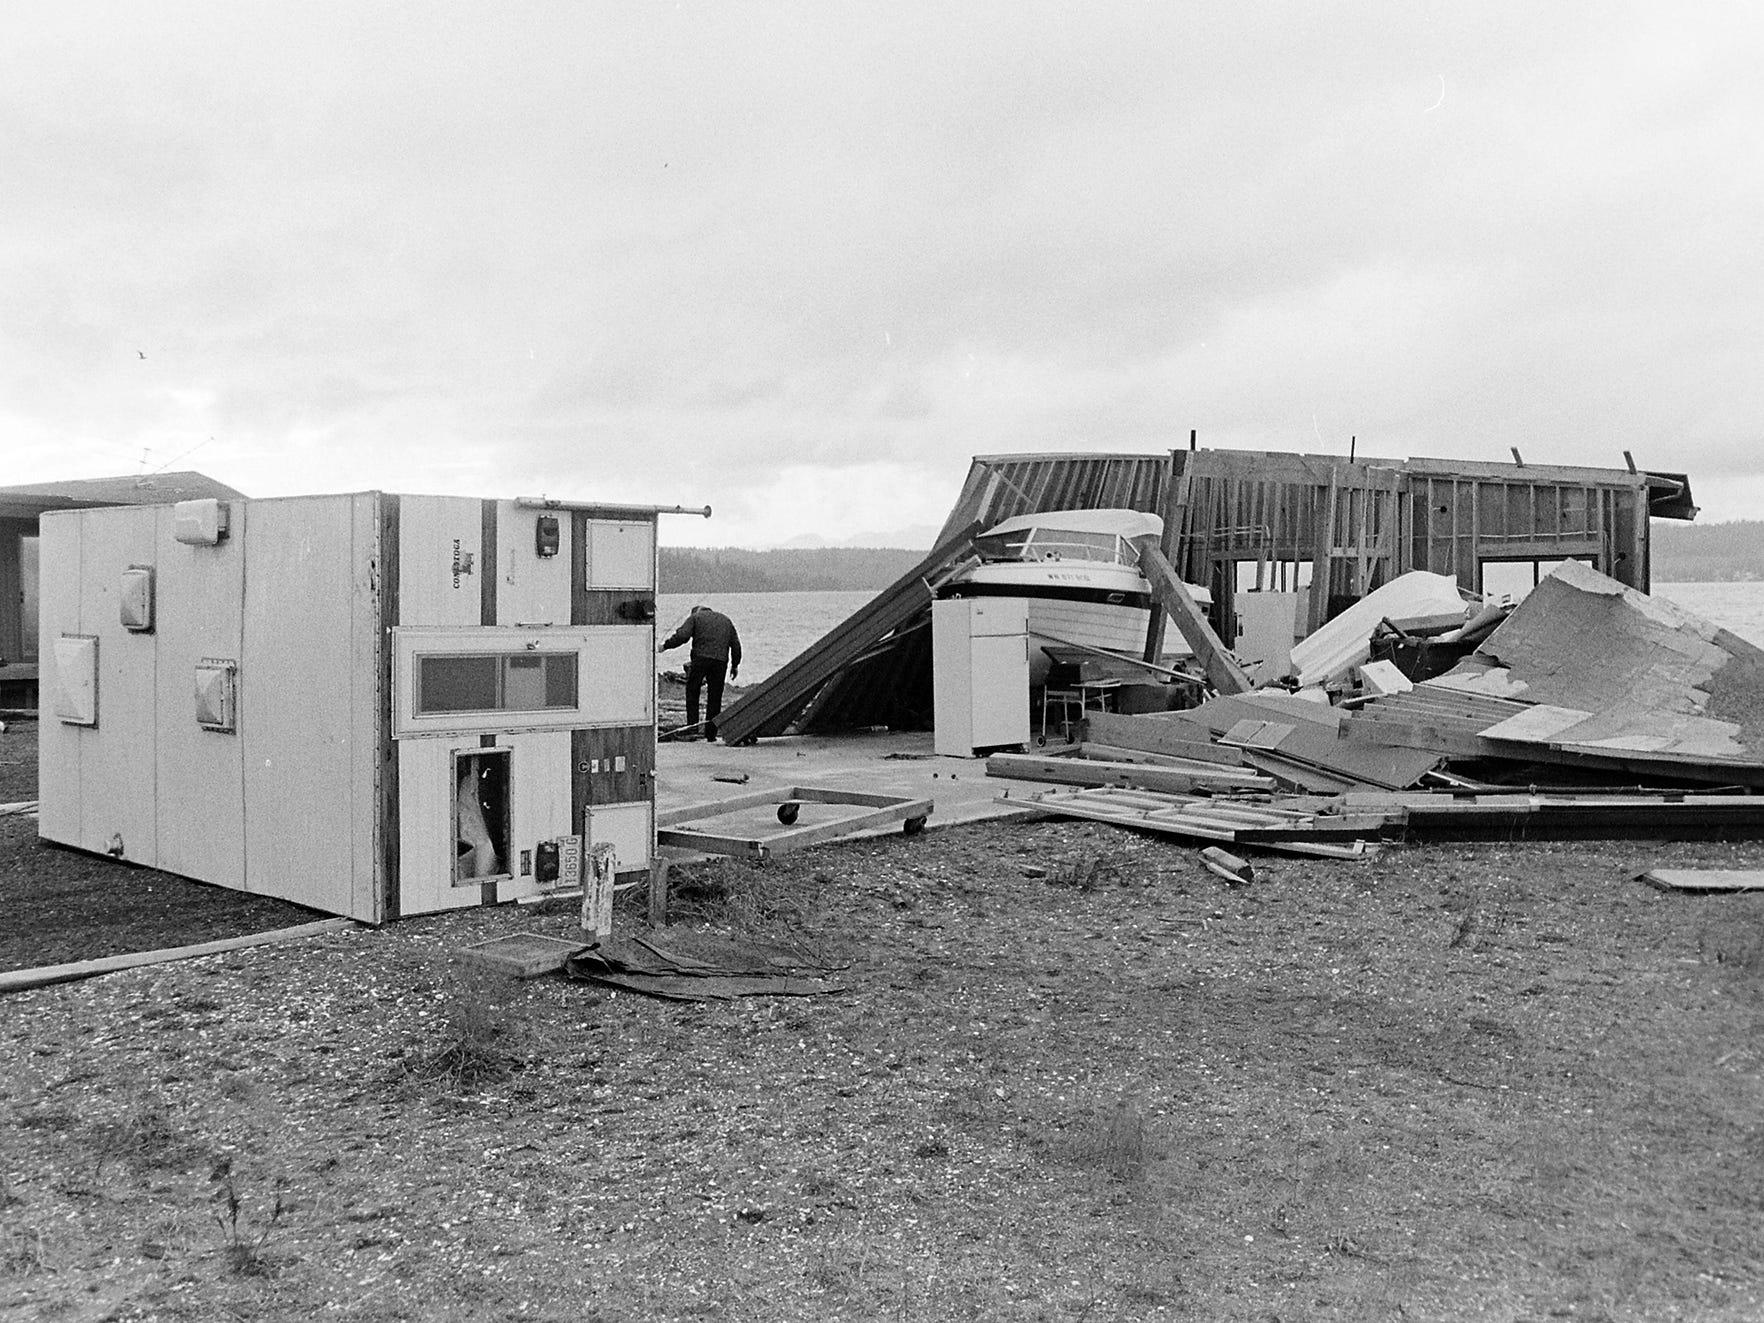 02/14/79Storm Damage